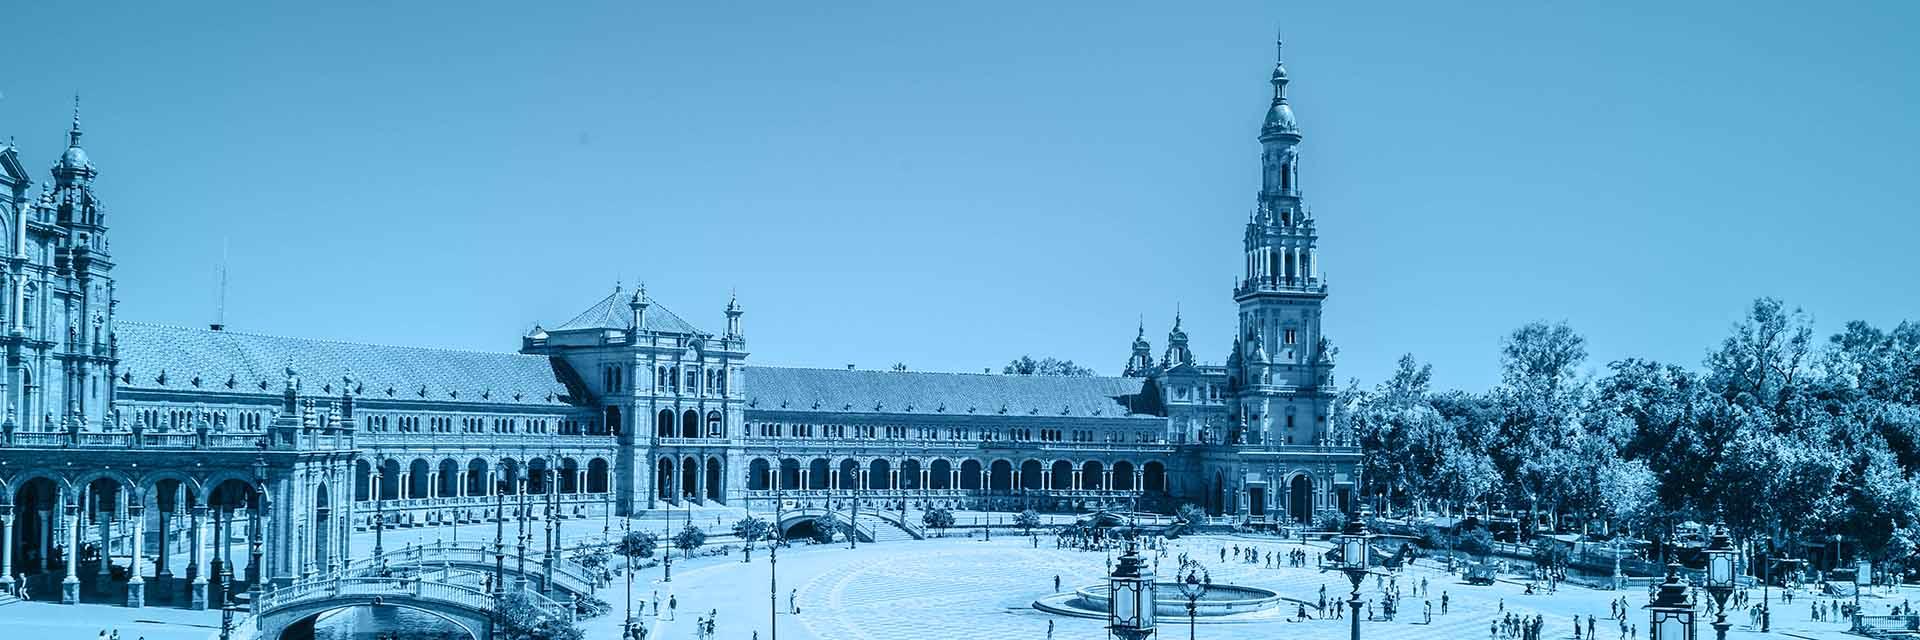 Sevilla Dil Okulları